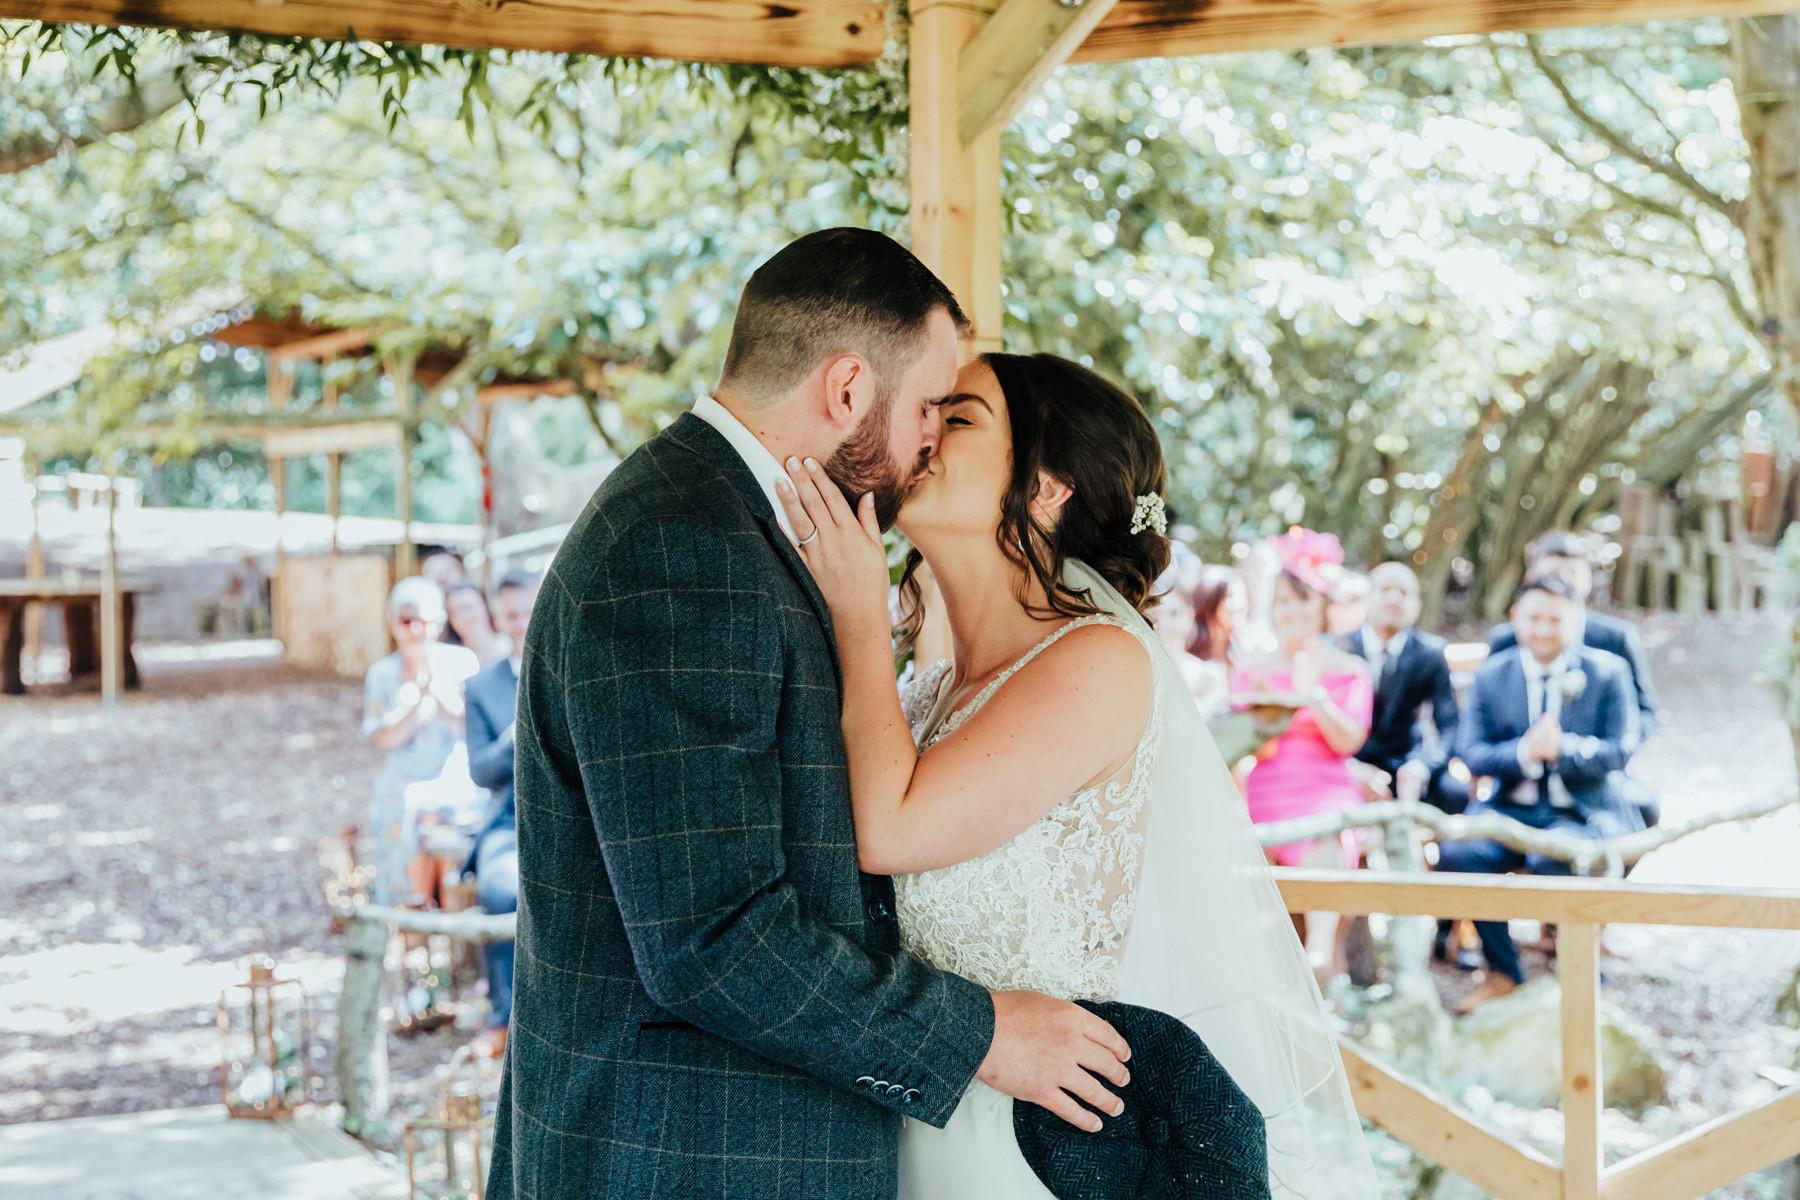 ceremony outdoors at hazlewood castle woodland wedding venue